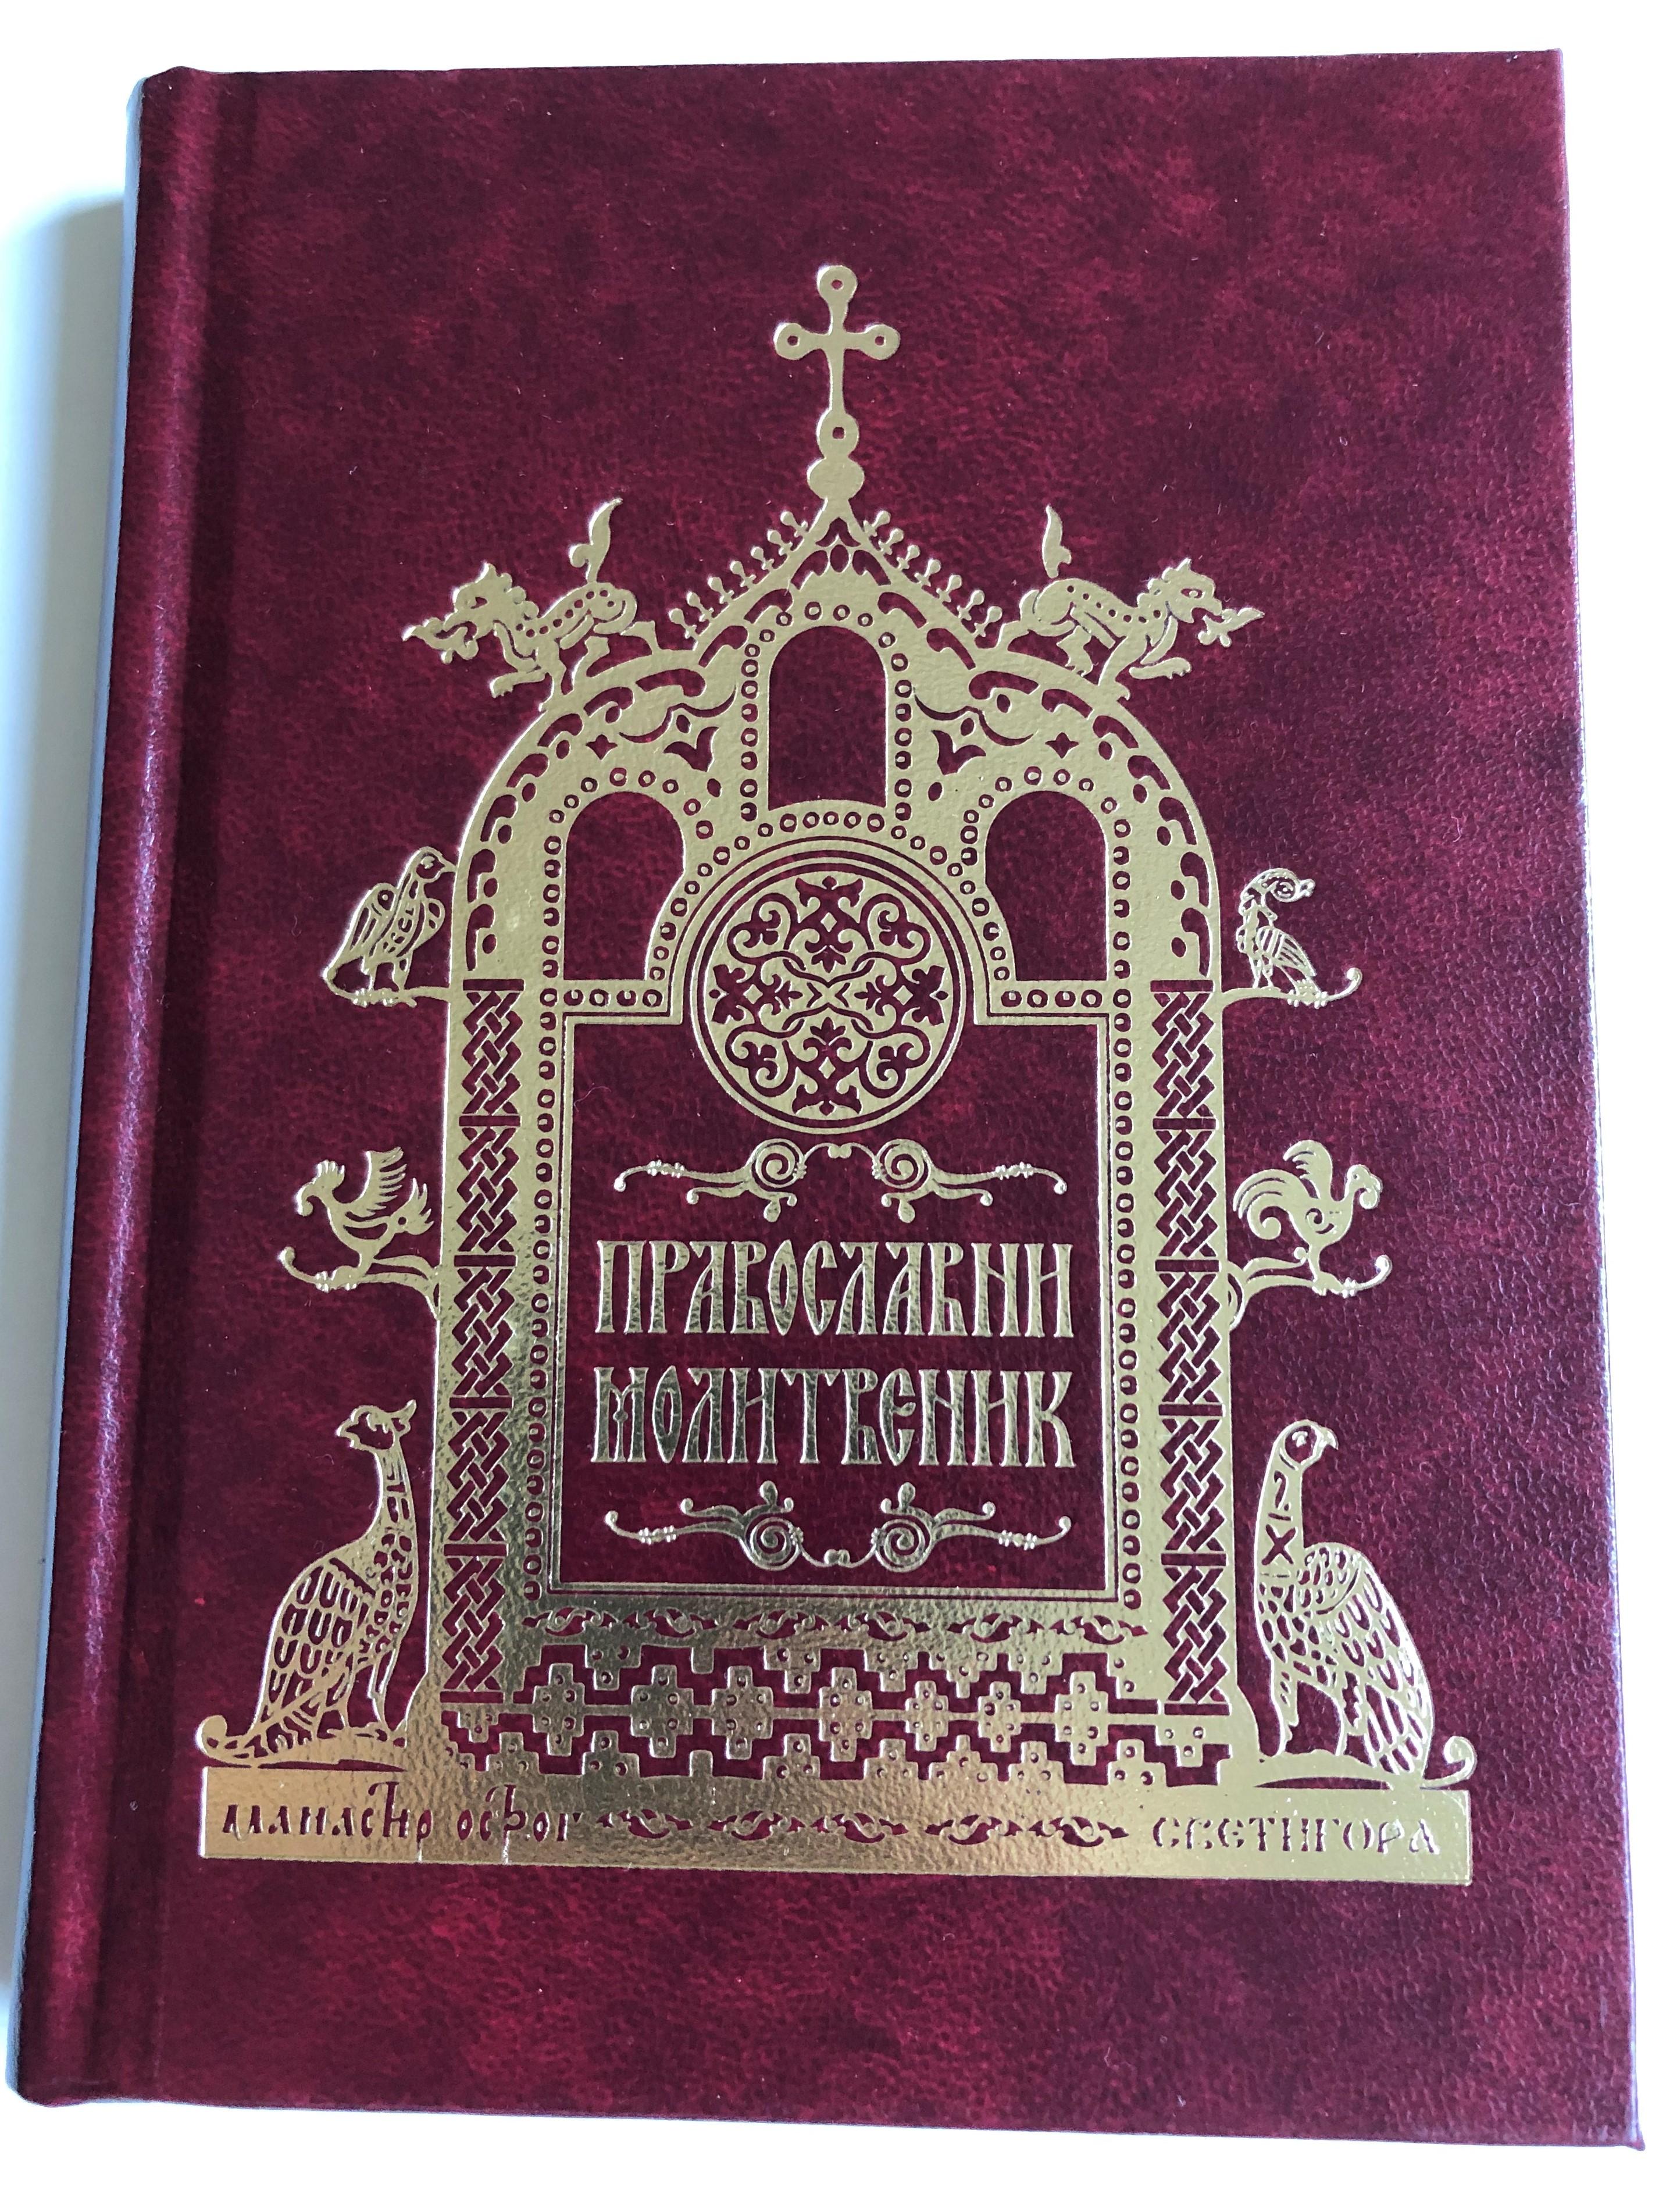 pravoslavni-molitvenik-small-serbian-orthodox-prayer-book-2015-1.jpg